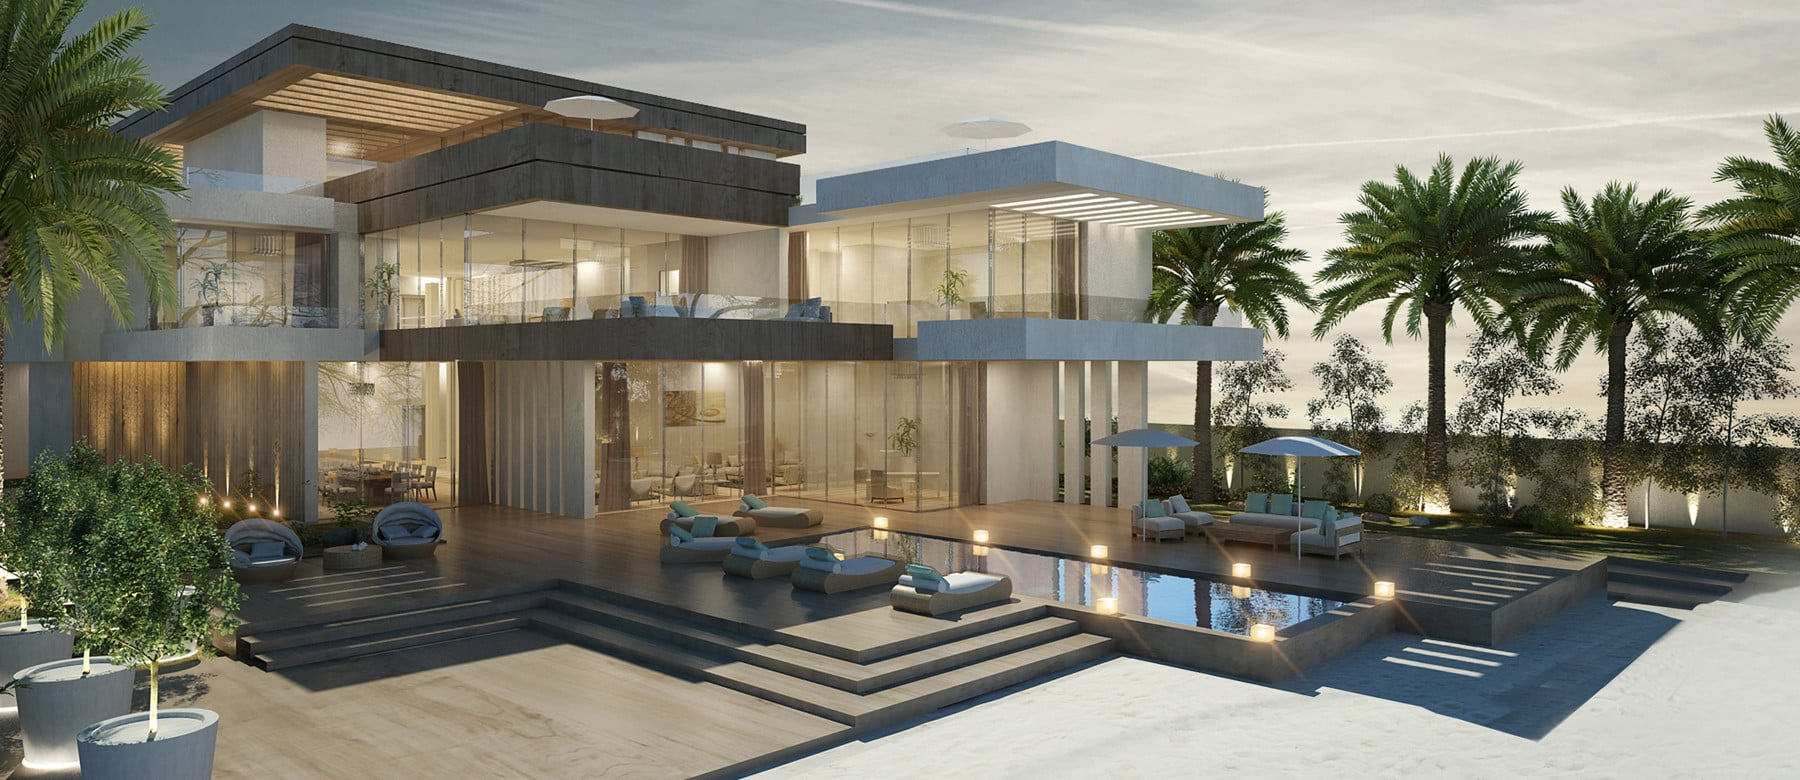 Nudra by IMKAN in Saadiyat Island. Luxury apartments for Sale in Abu Dhabi